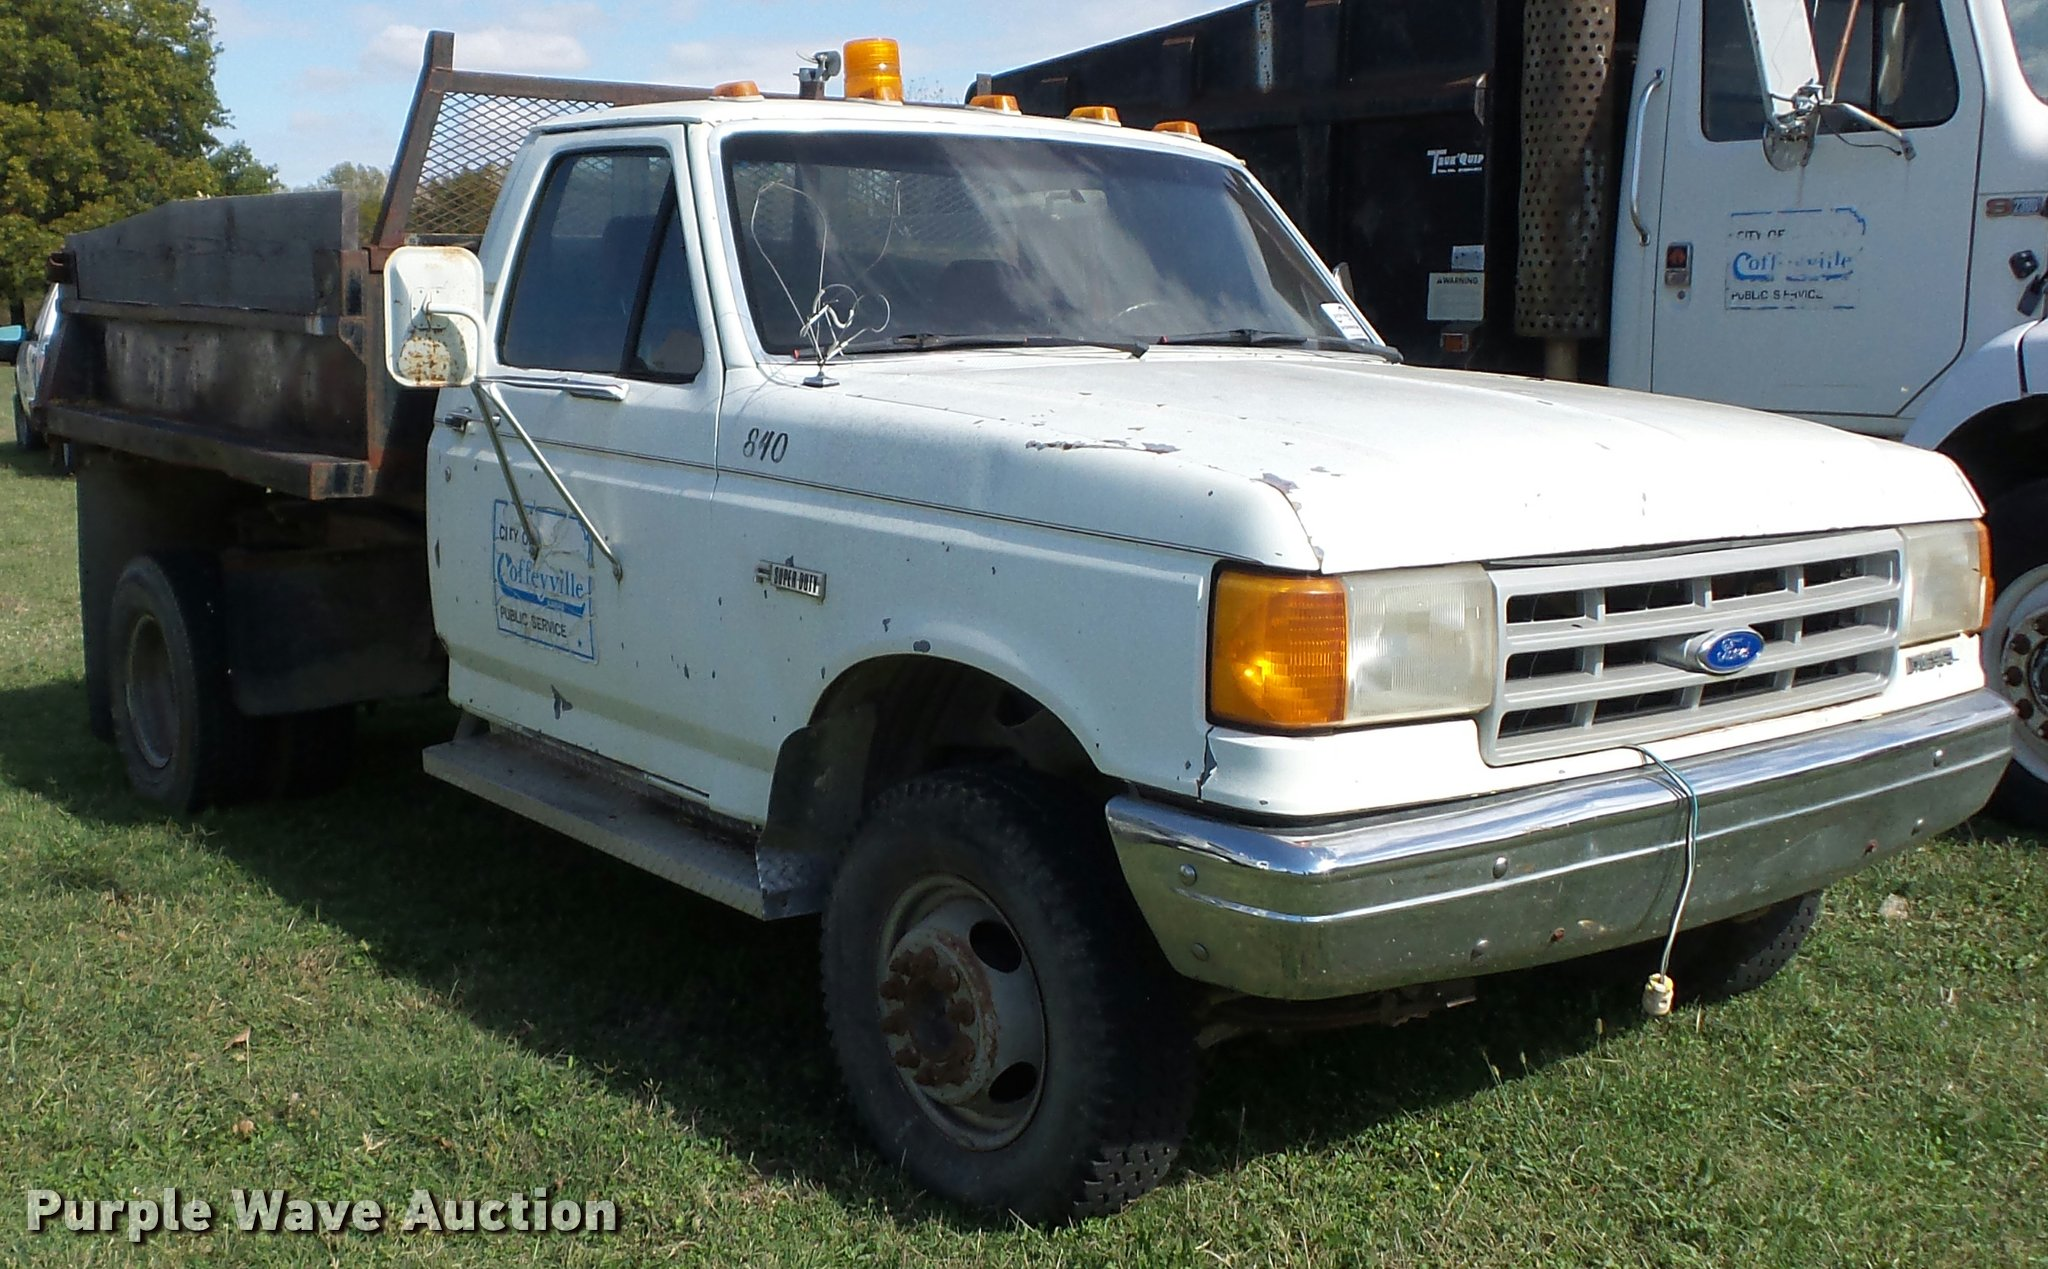 1991 Ford F450 Super Duty dump truck | Item L4418 | SOLD! No